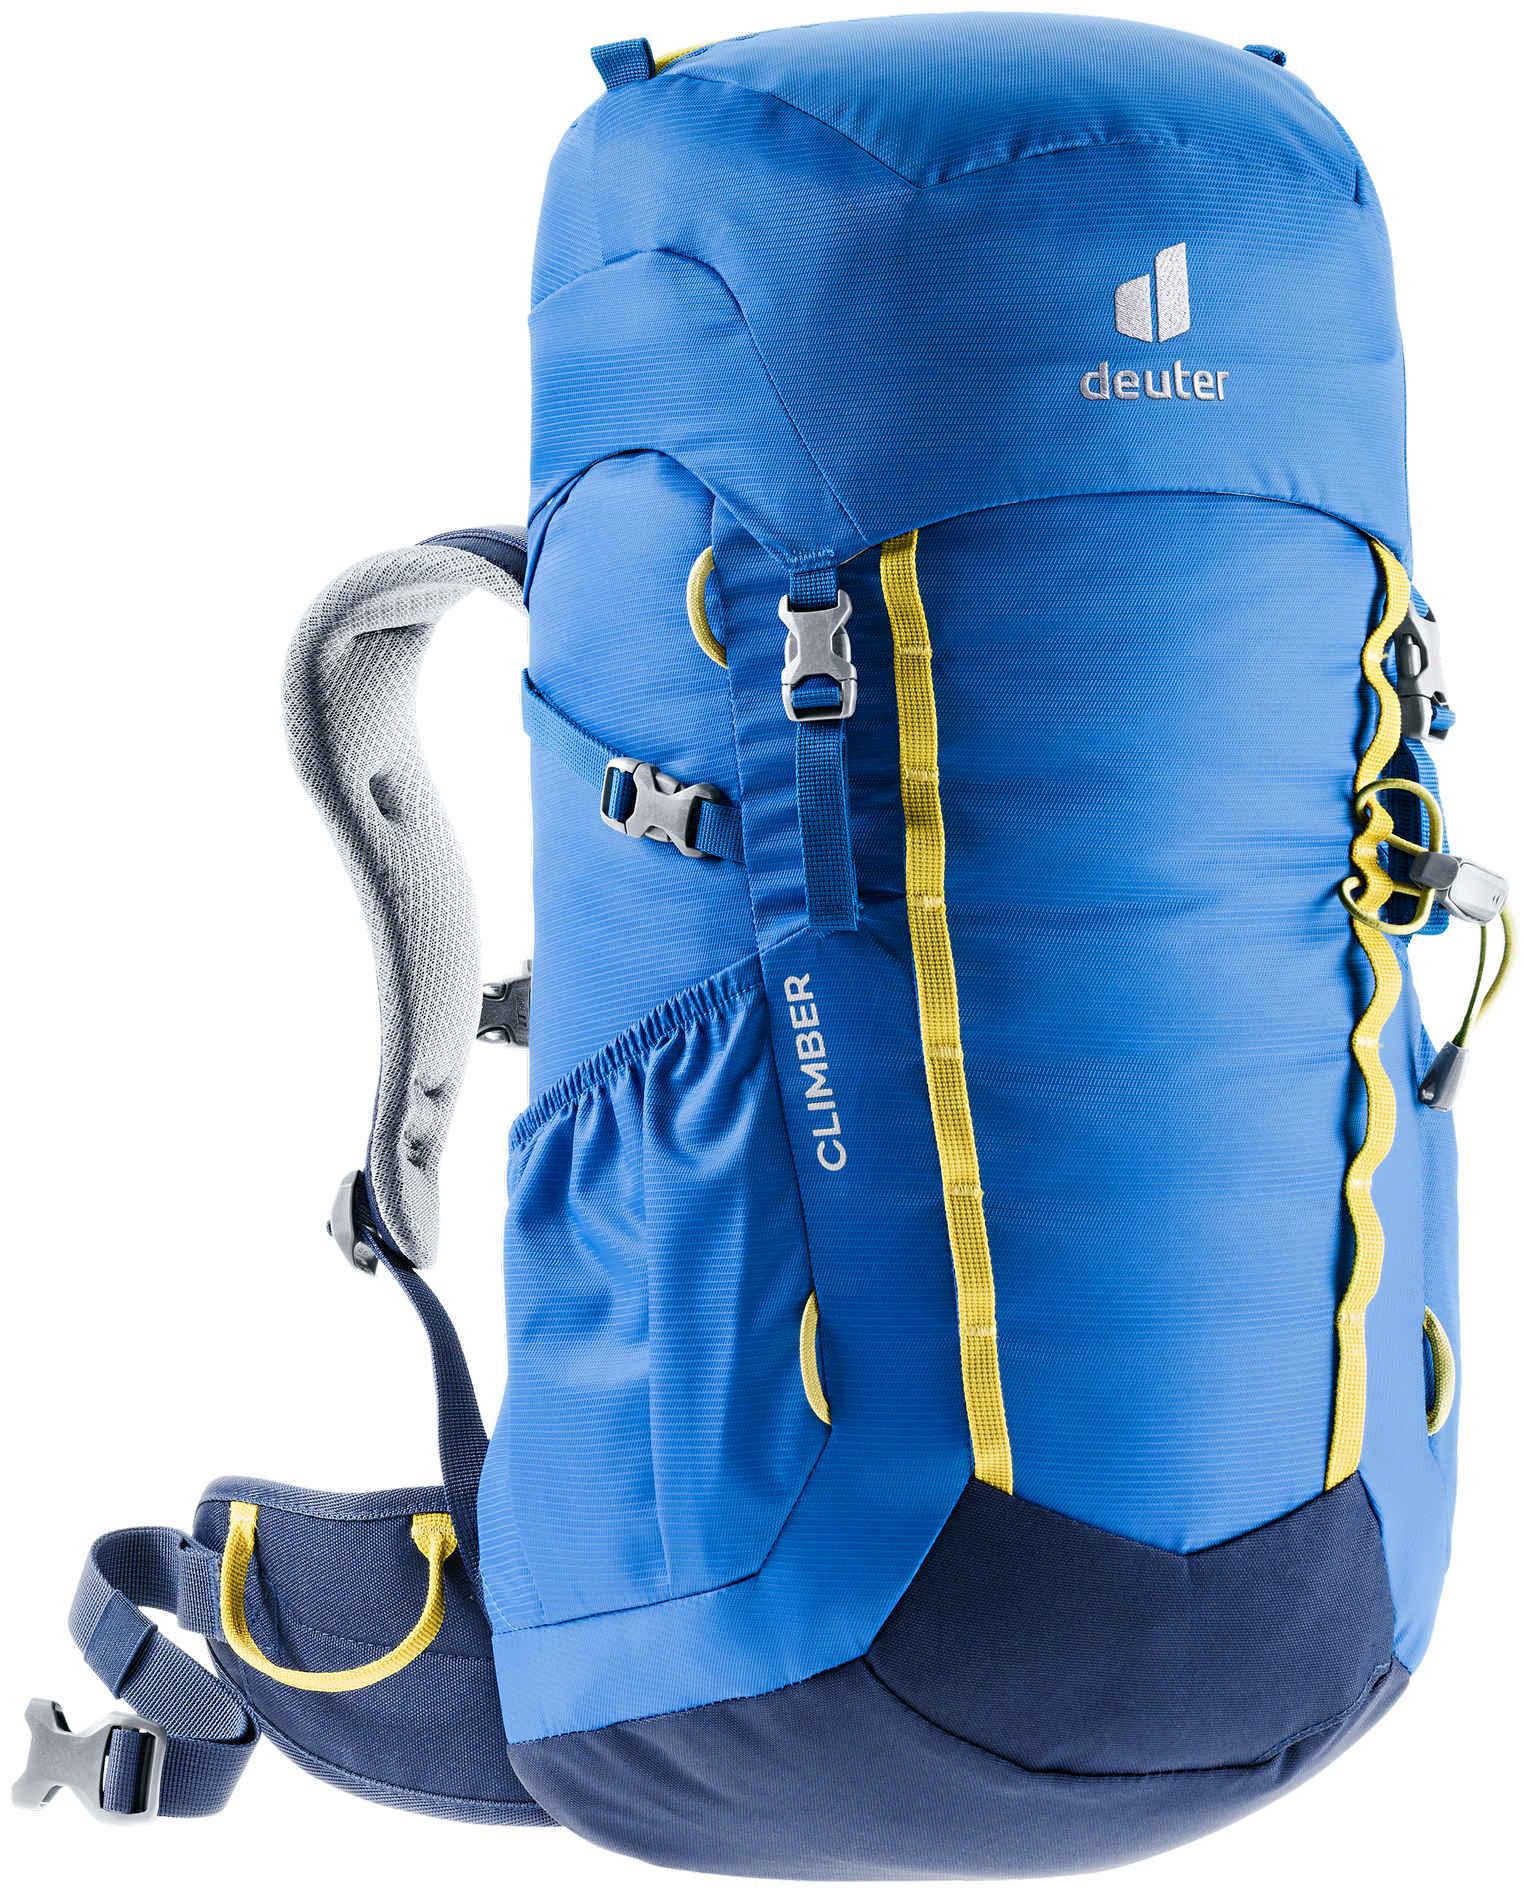 Детские рюкзаки Рюкзак детский Deuter Climber 22 (2021) 3611021-1316-Climber-s20-d0.jpg